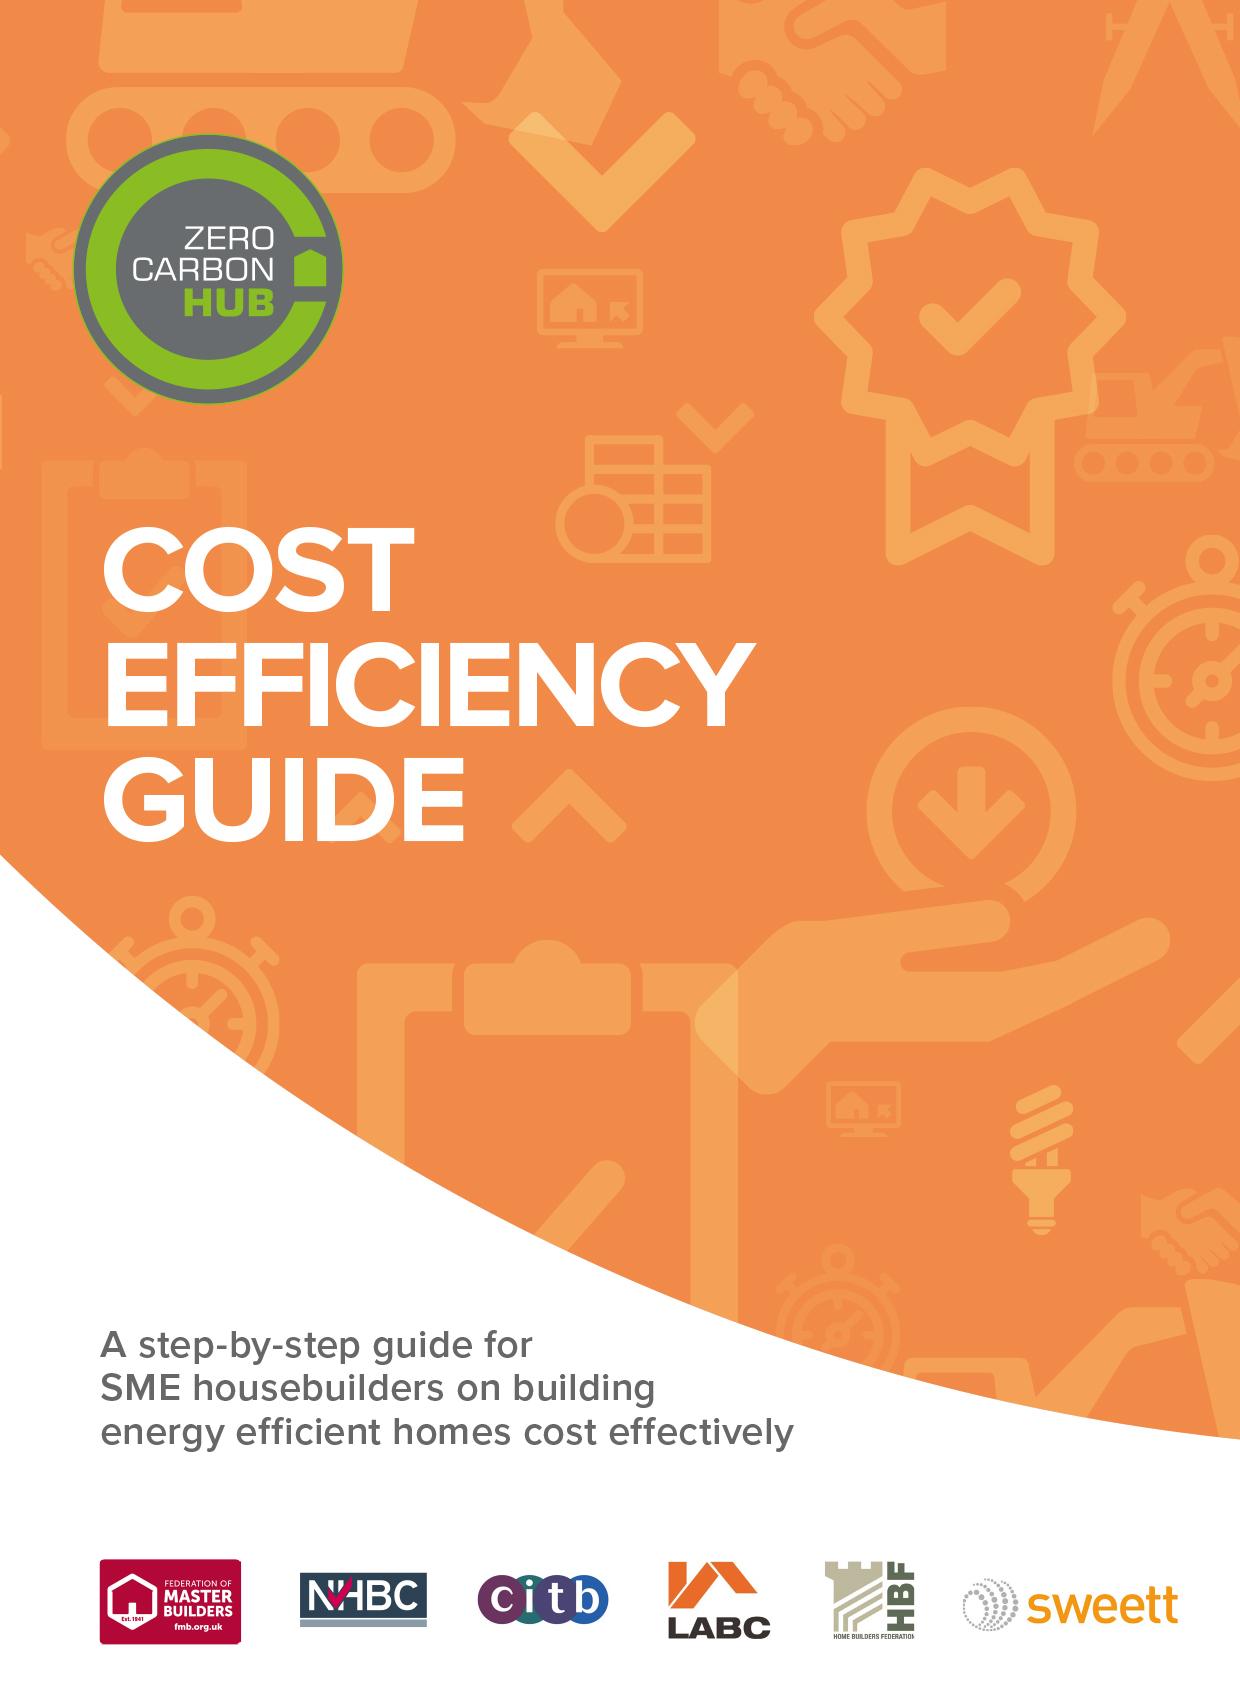 Cost Efficiency Guide